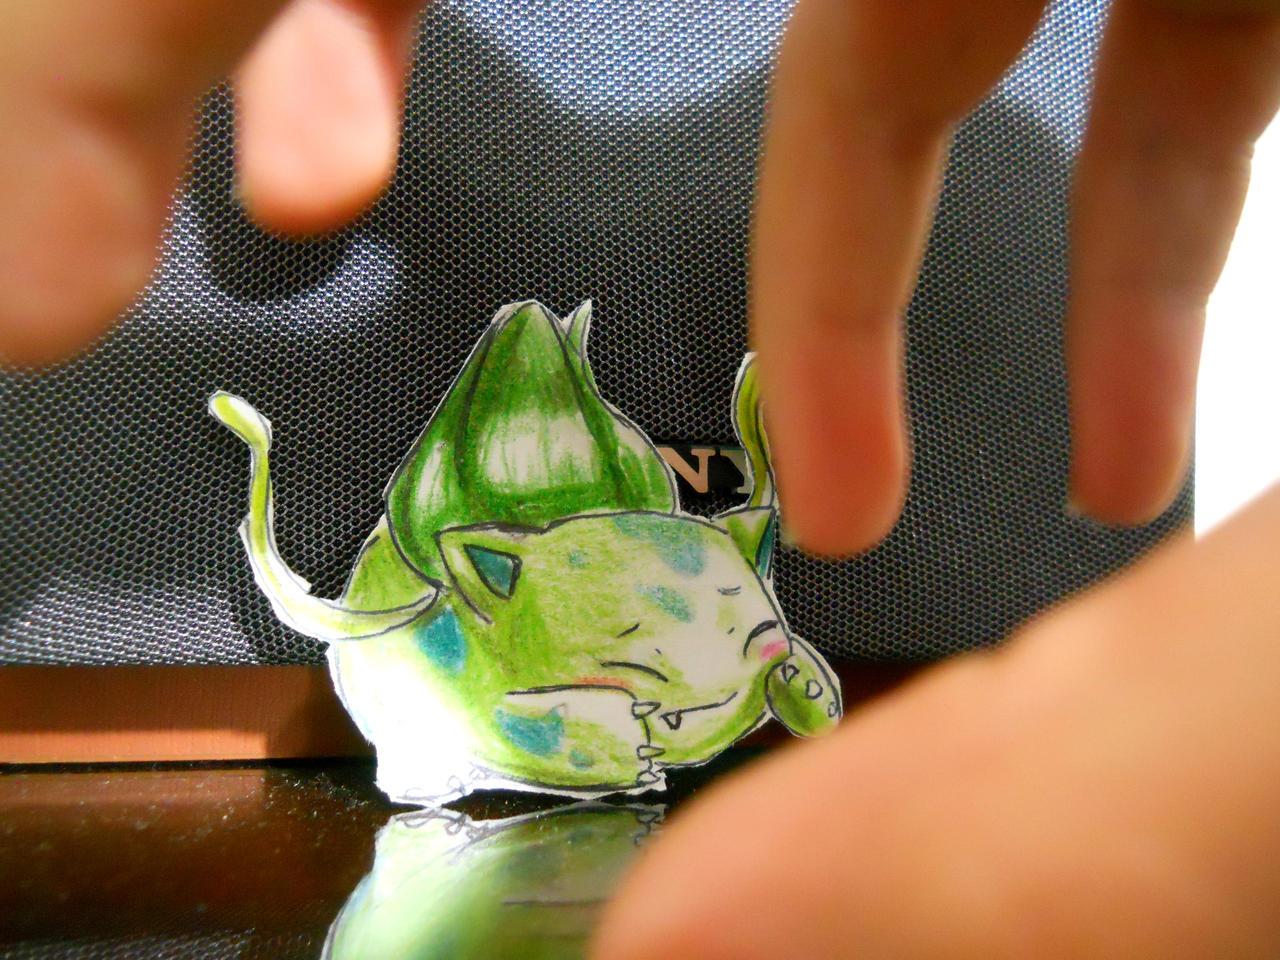 Paperchild 39. Pokemon 1 - Bulbasaur by FuriarossaAndMimma